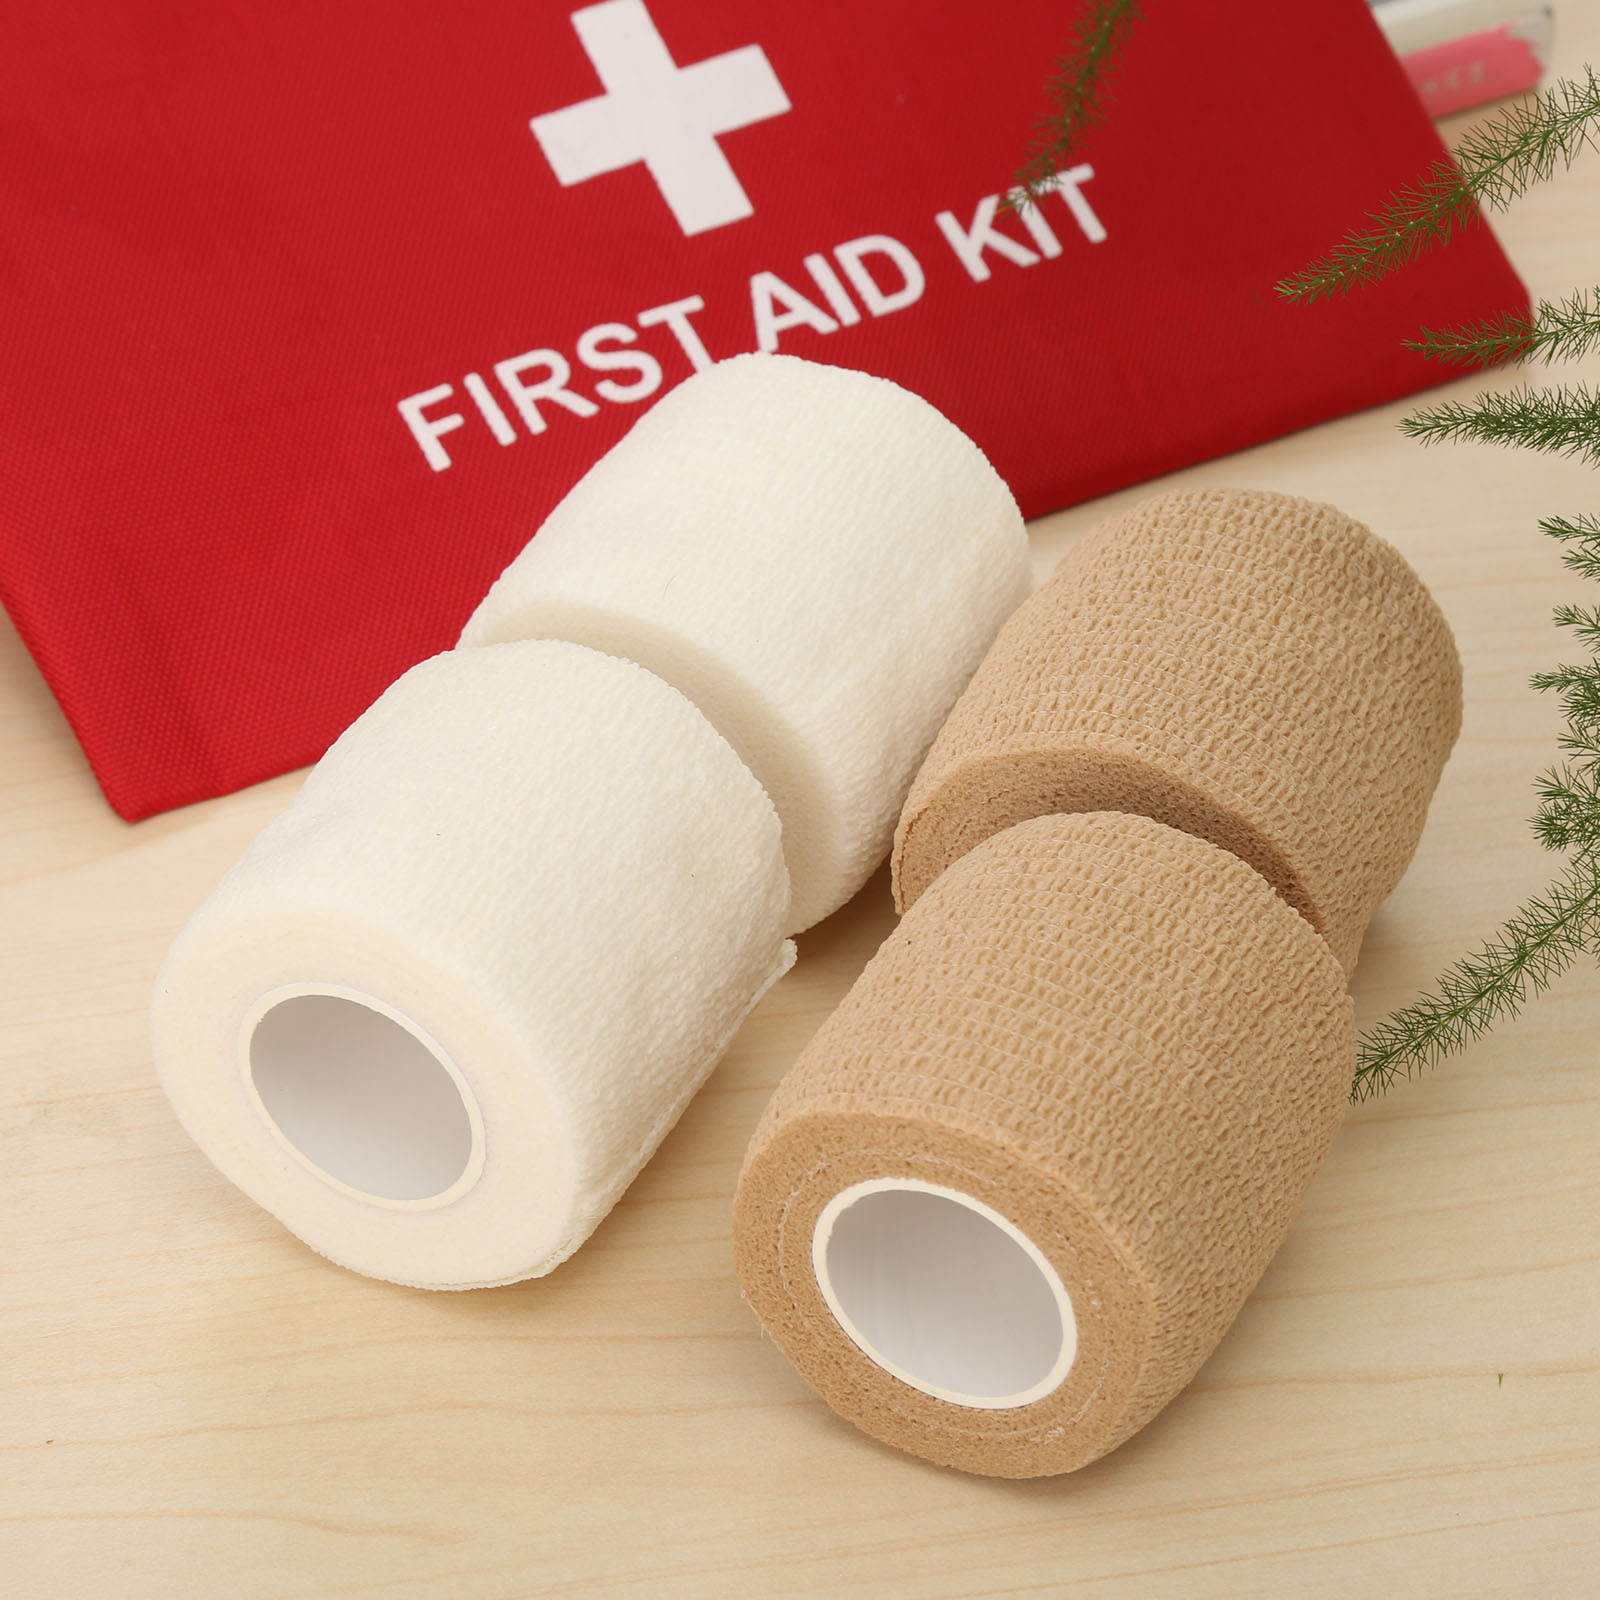 2pcs 2.5cm*4.5 Medical Non-woven Self-adhesive Bandage Medical Elastic Tape First Aid Wrap Bandage Elastic Bandage Tactical Pads